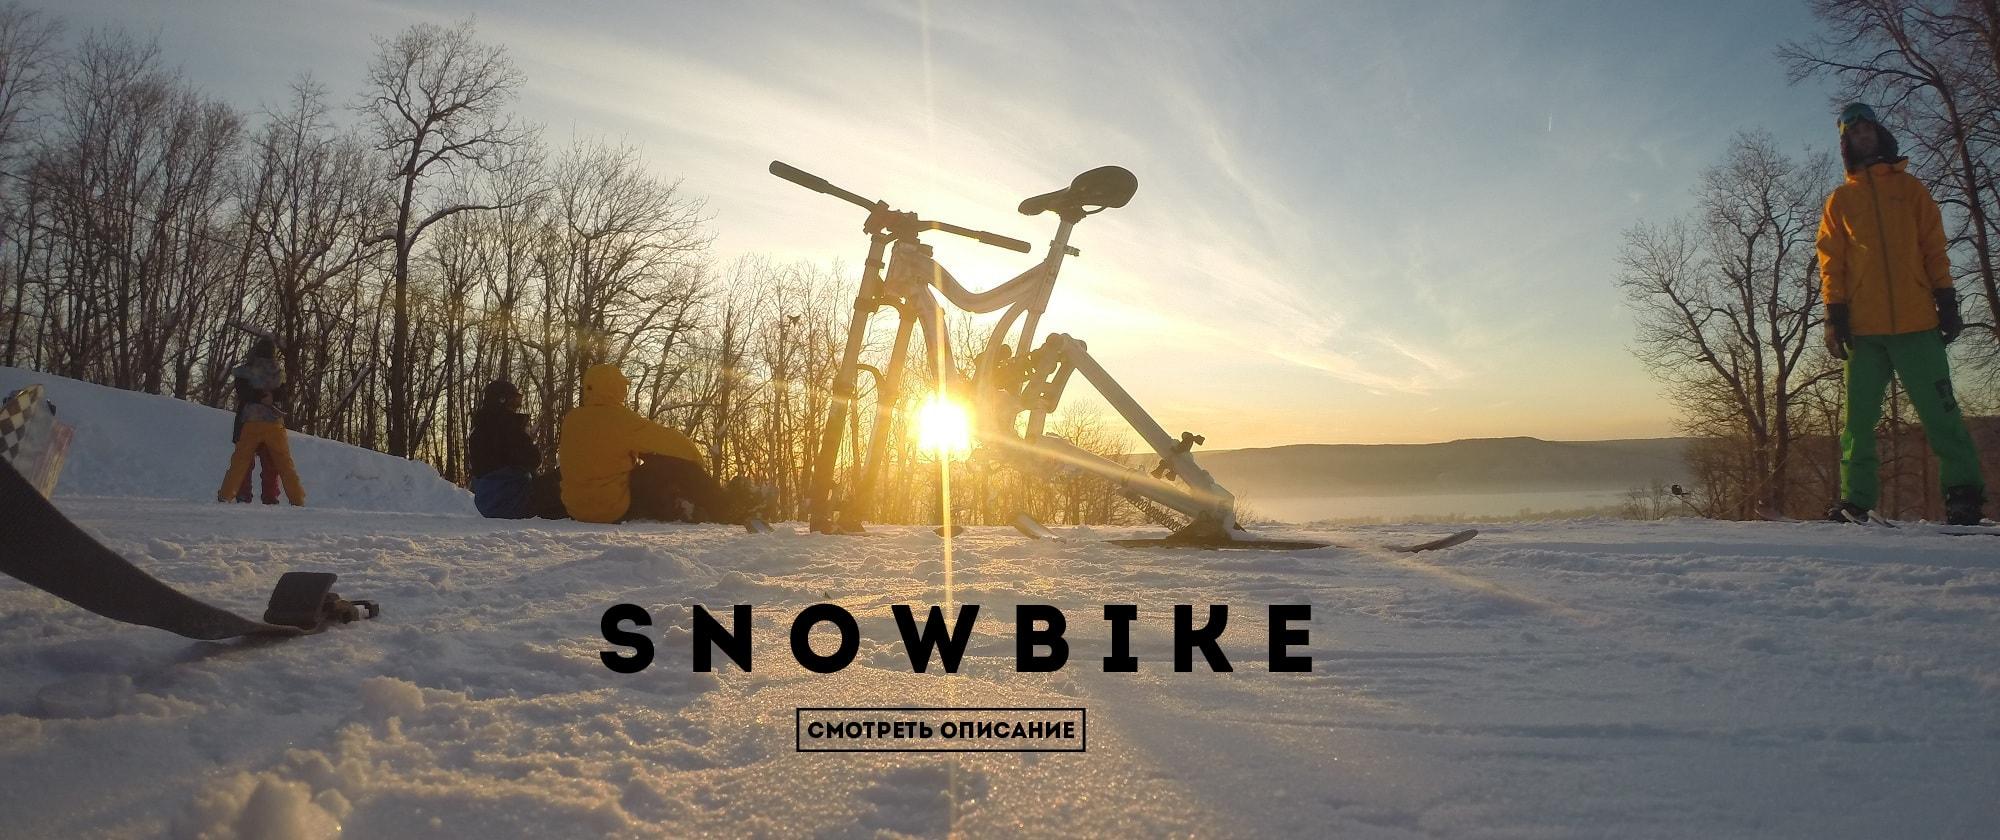 Home_snowbike_2-min